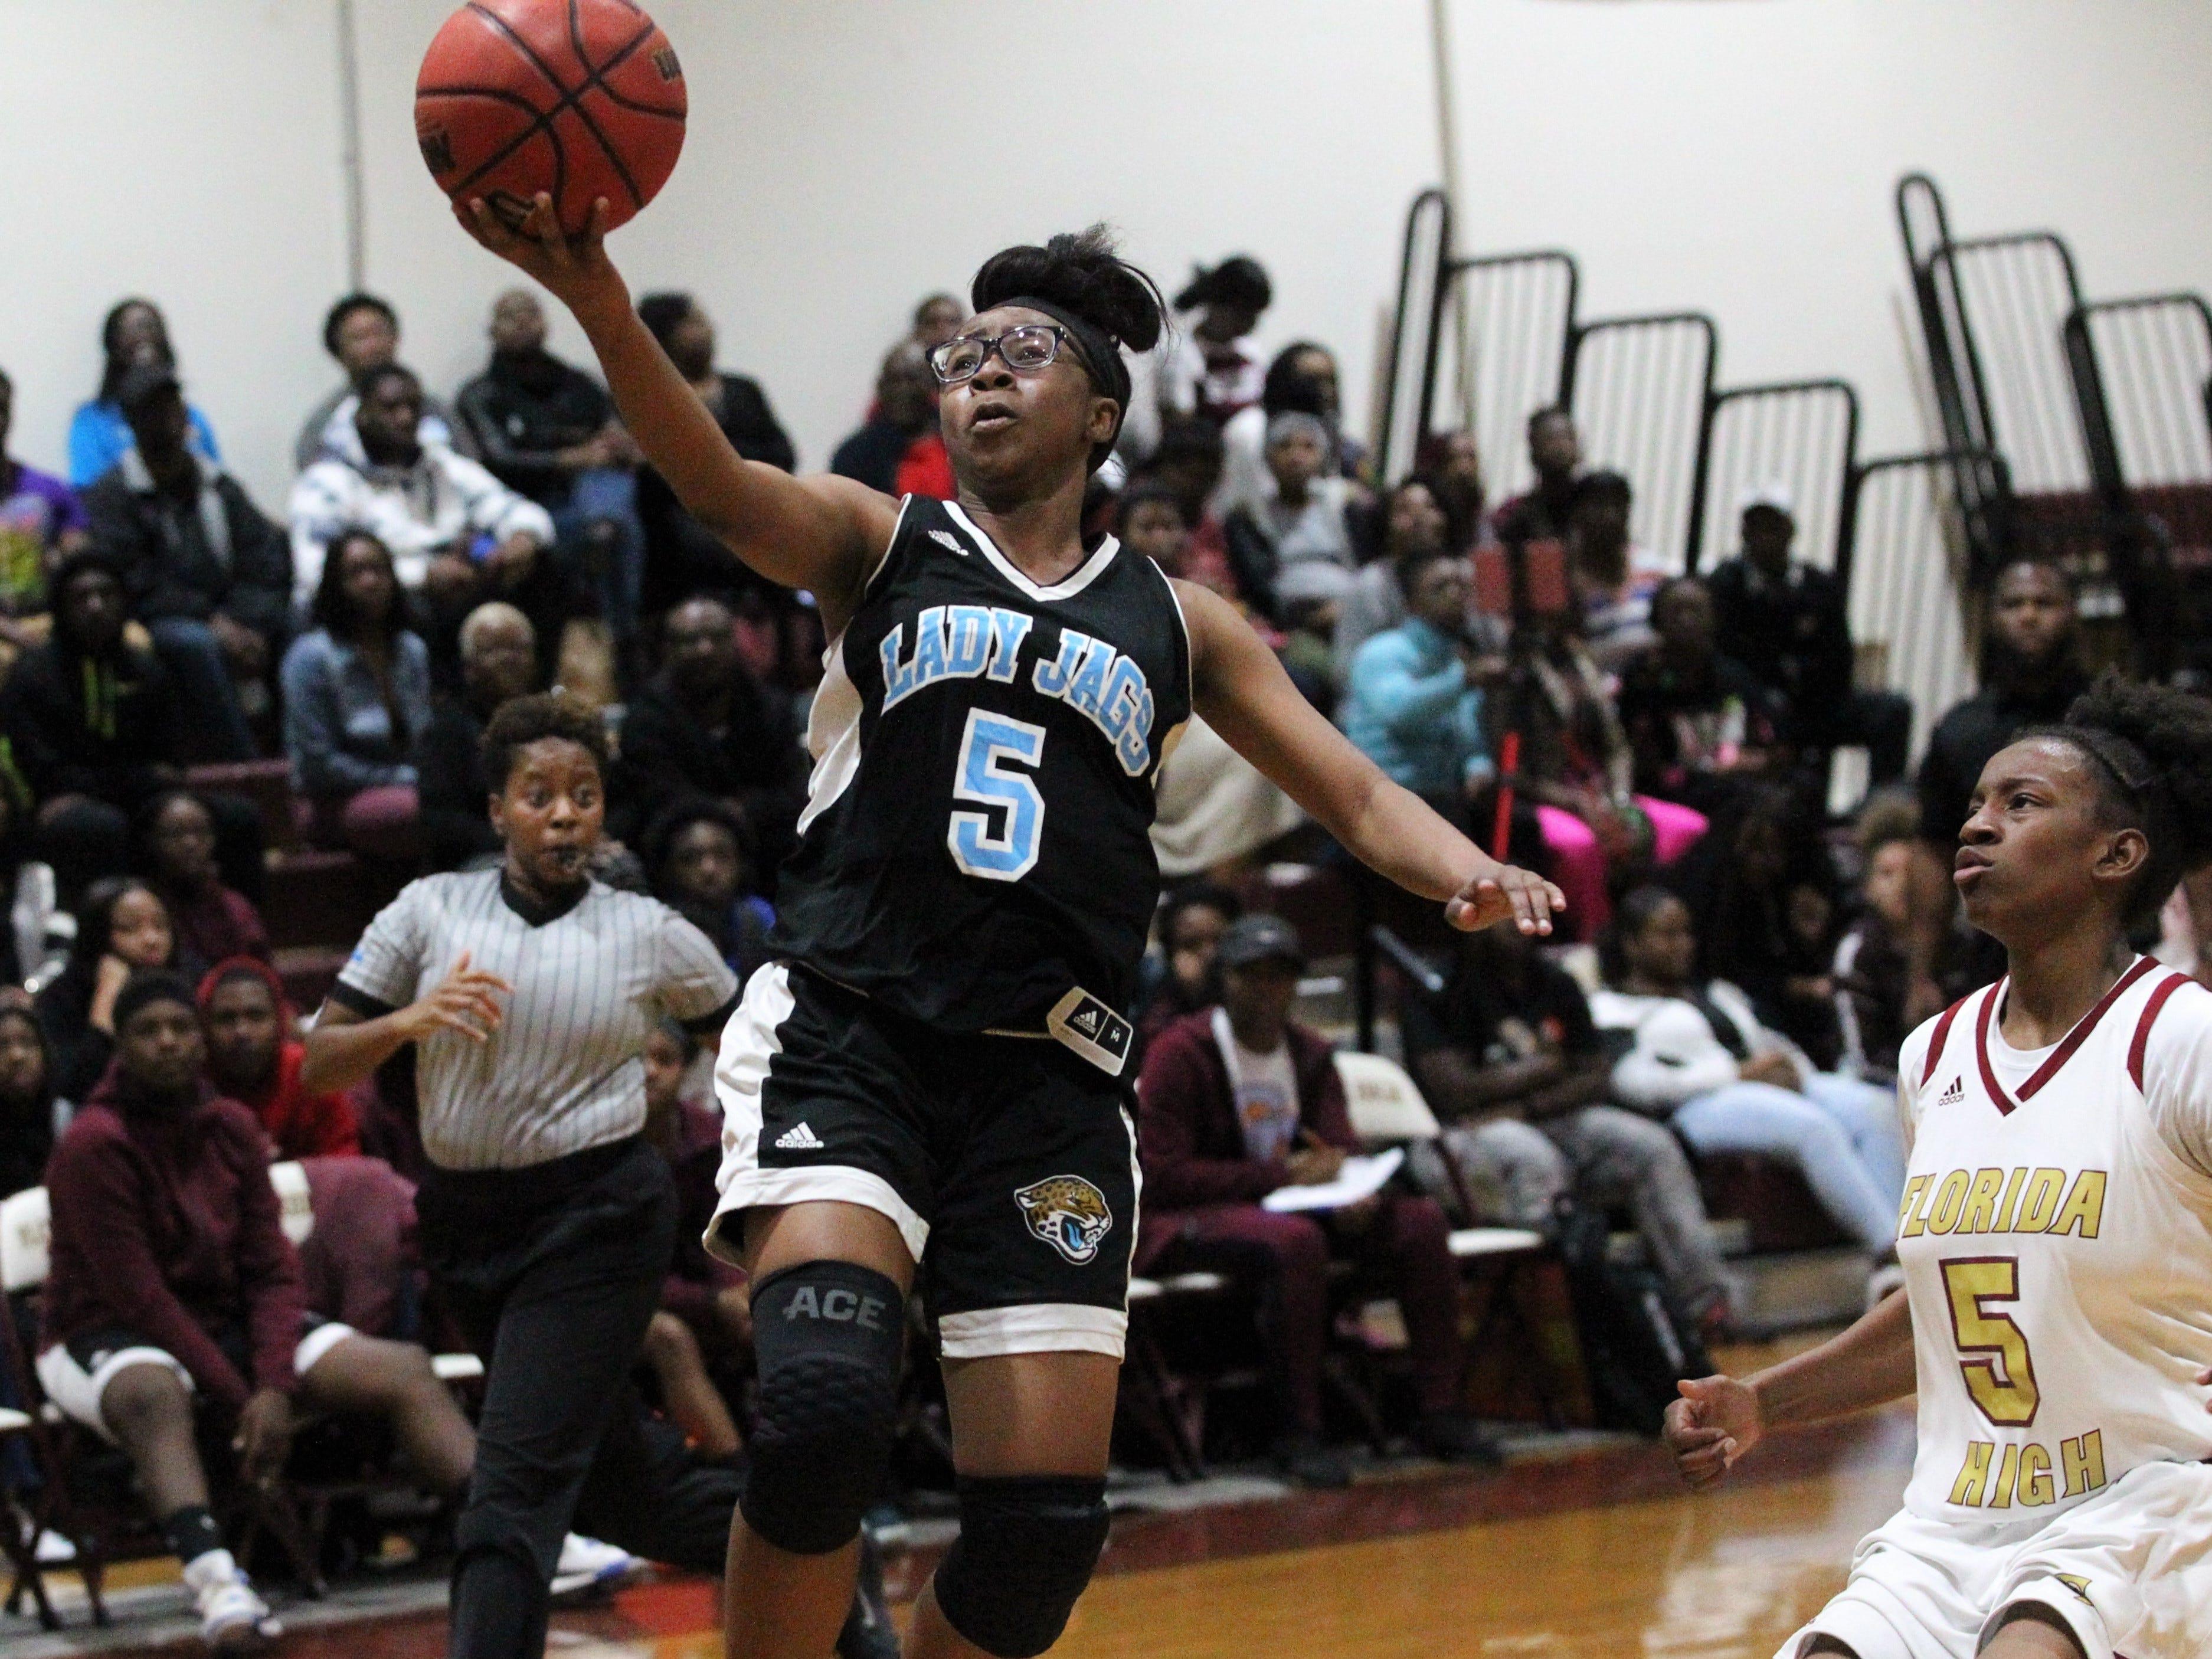 Gadsden County point guard Ta'Nija Watson scoops a layup as Florida High beat Gadsden County 69-53 on Jan. 17, 2019.